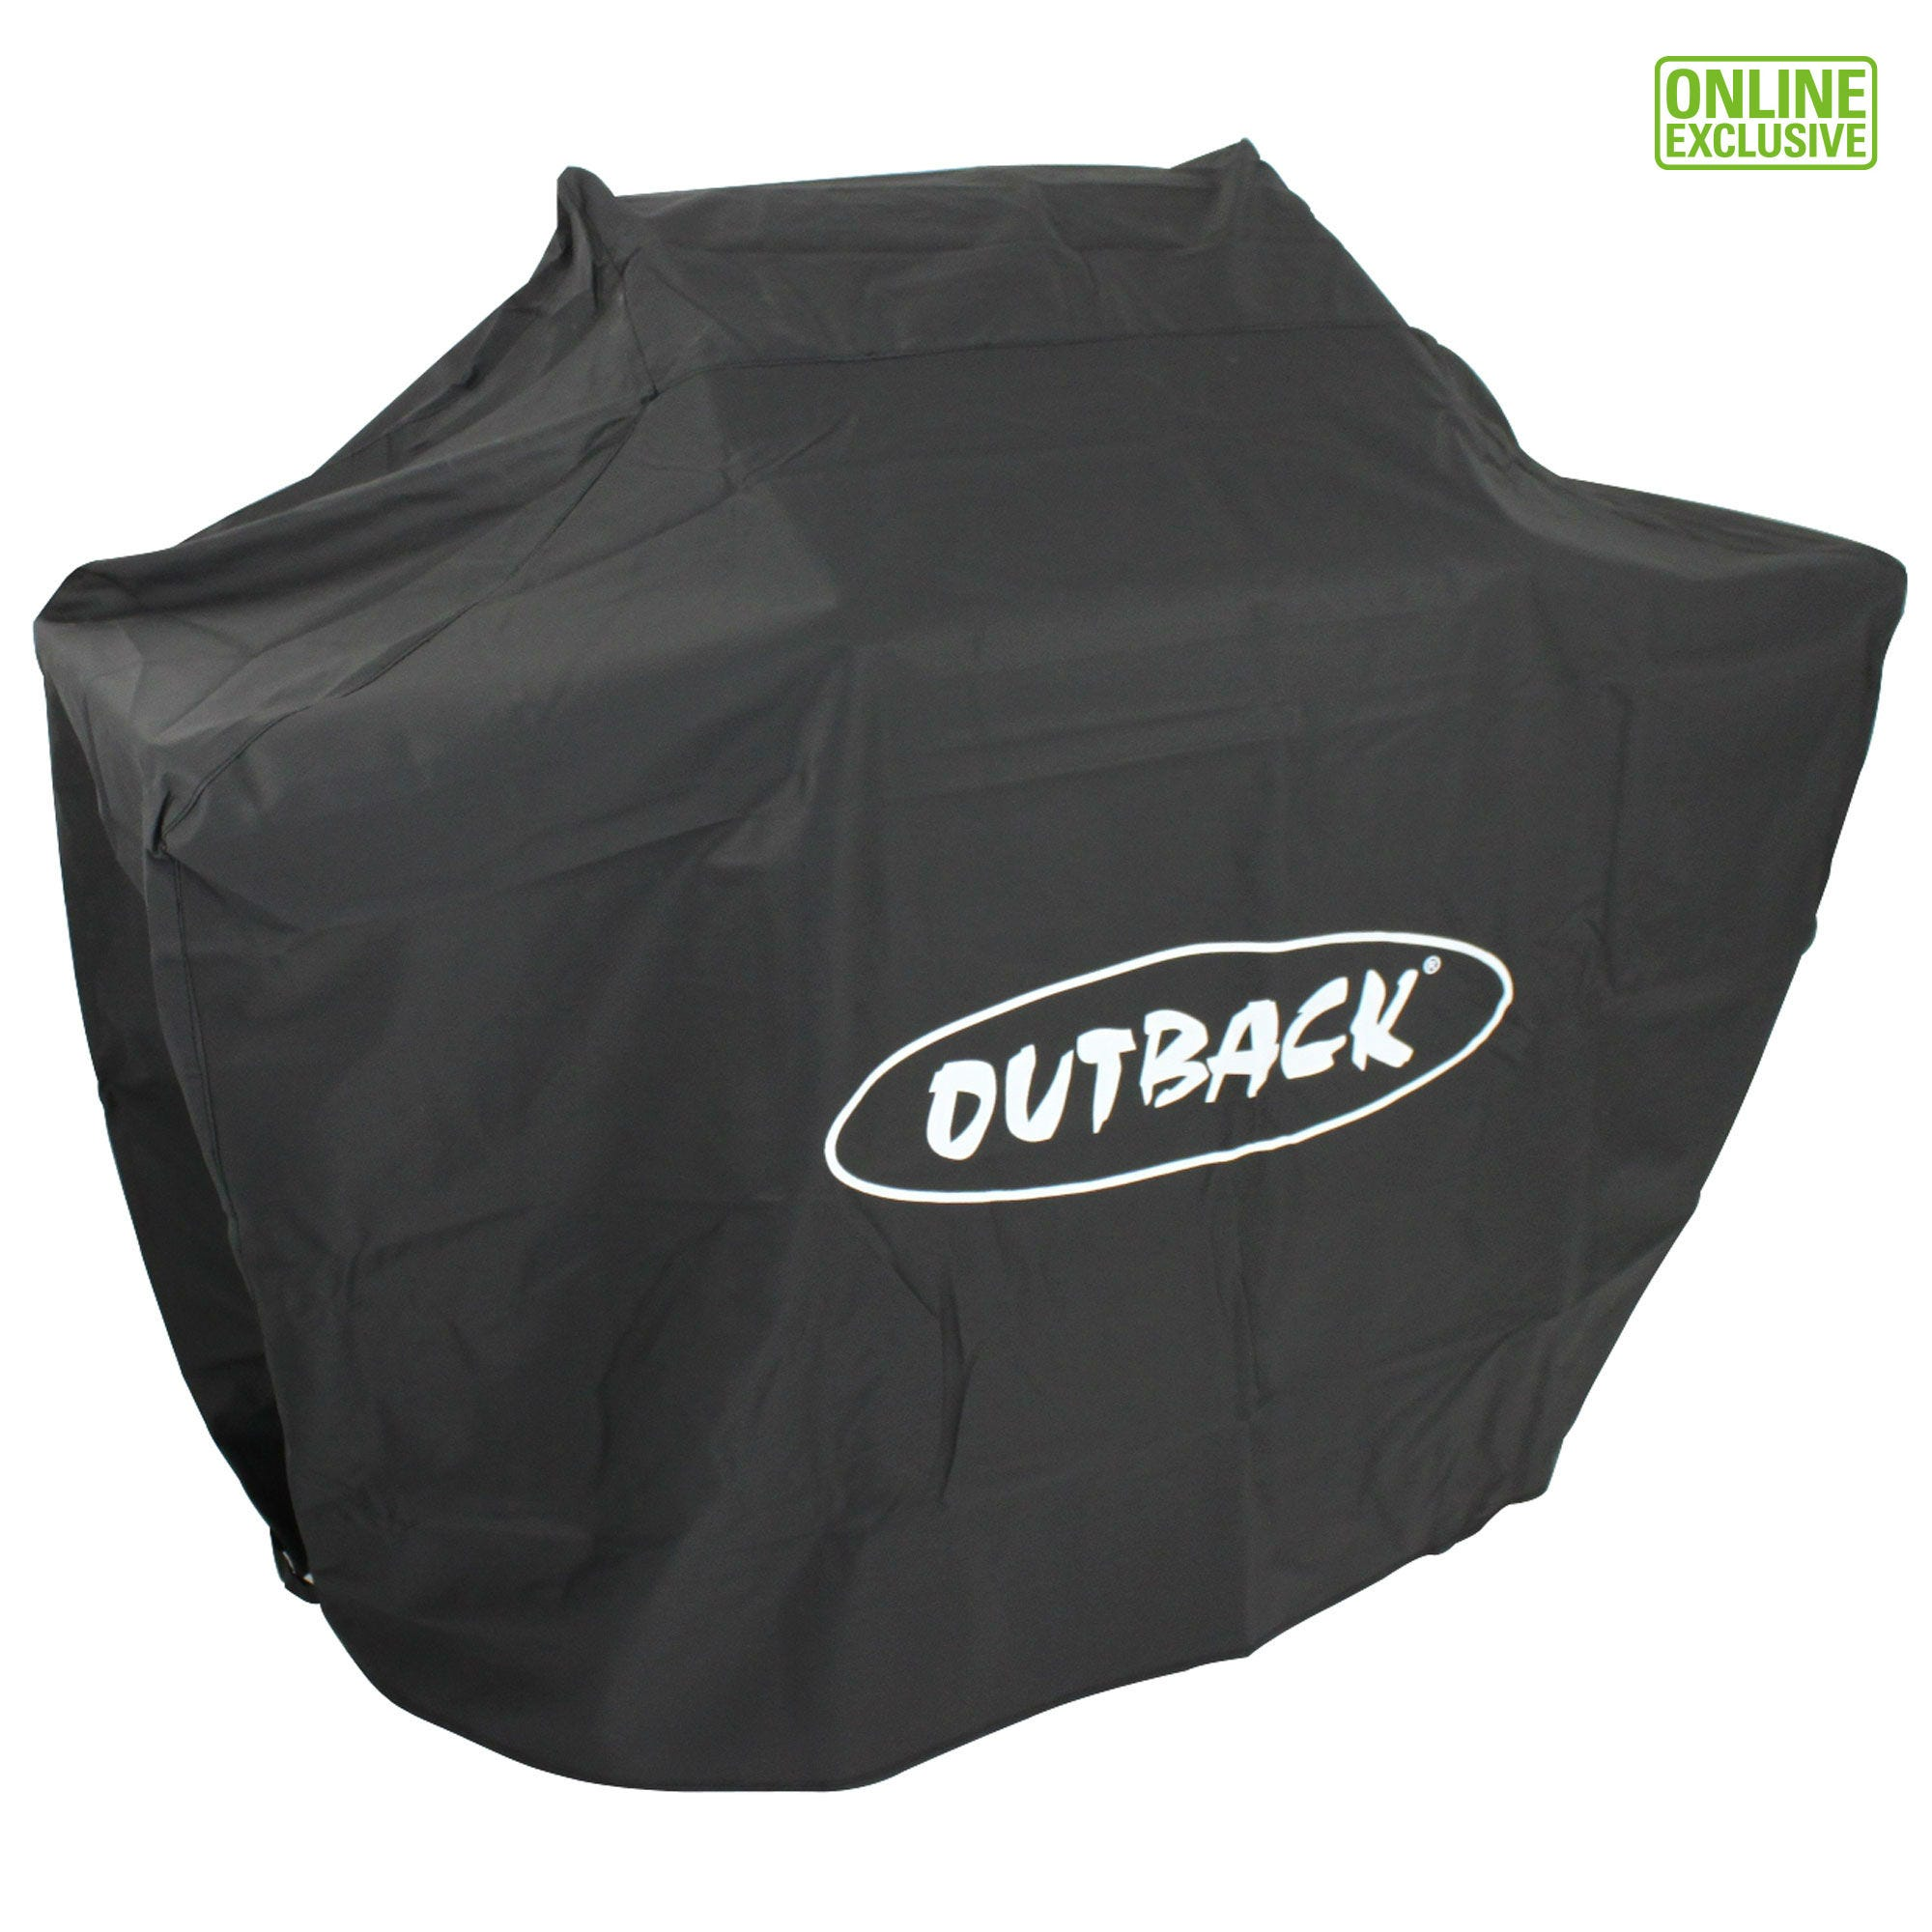 Image of Outback Hunter/Spectrum 3-Burner Hooded Barbecue Cover